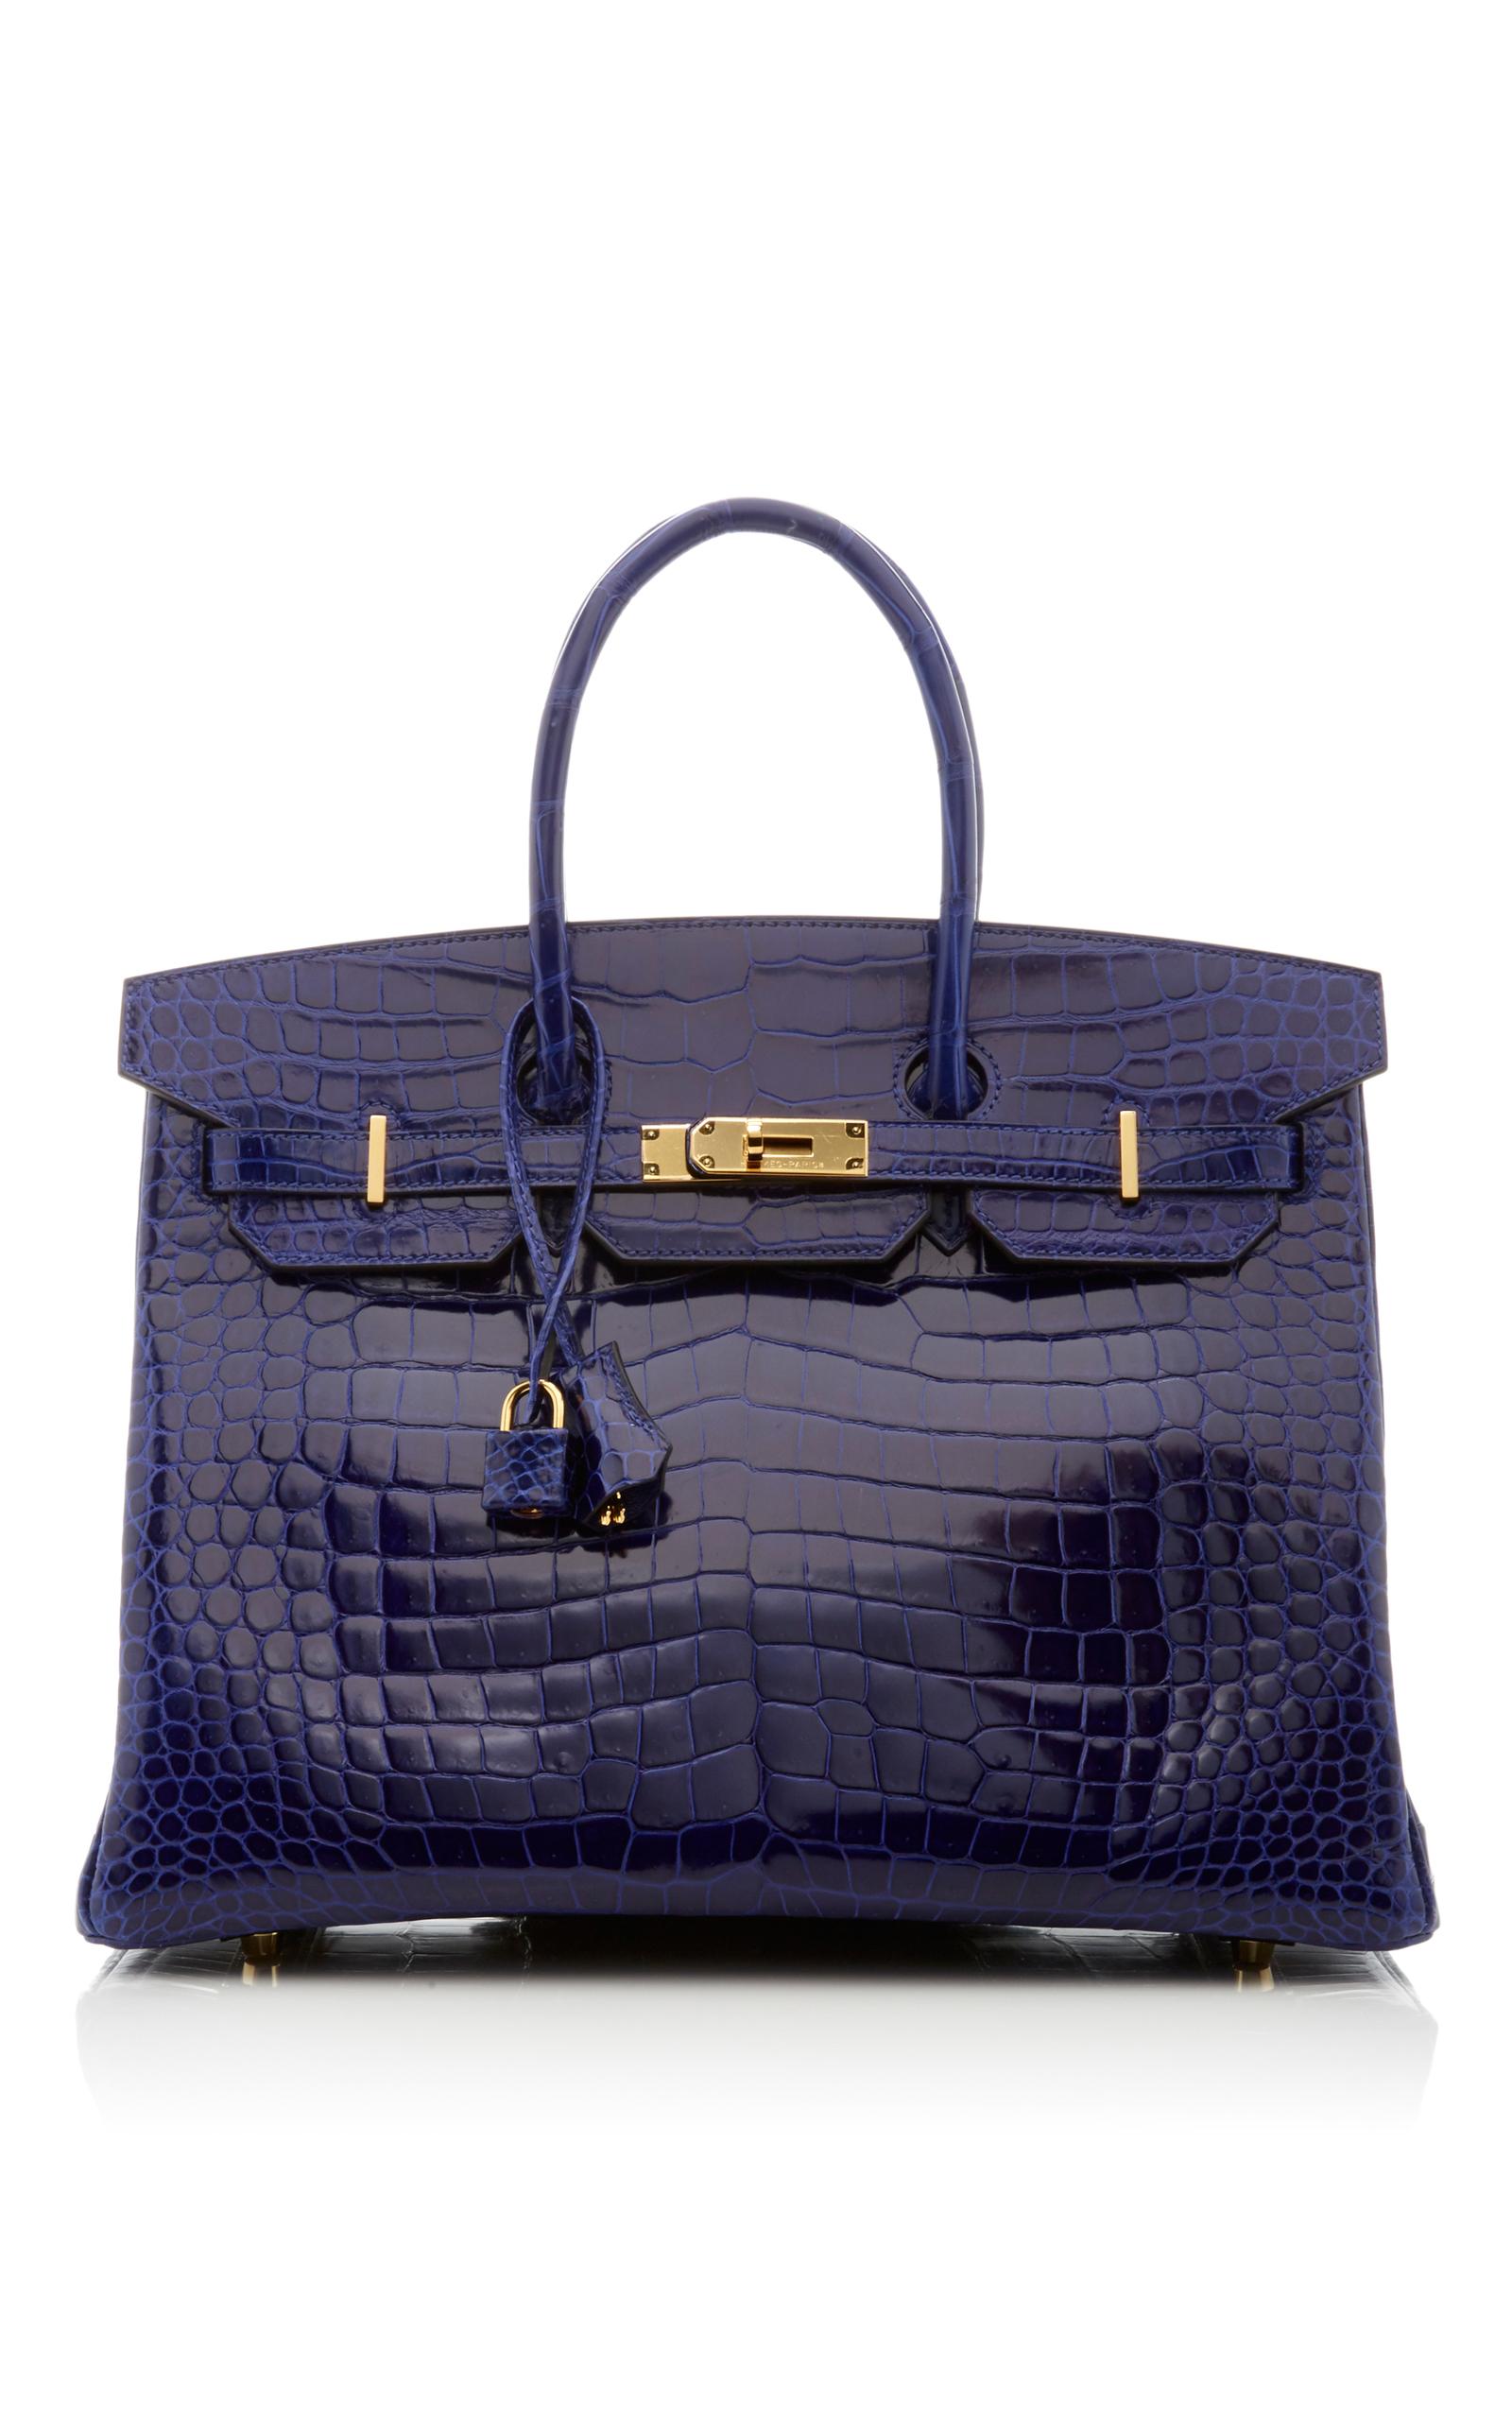 9236921674e Hermes VintageHermes 35cm Blue Electric Shiny Porosus Crocodile Birkin.  CLOSE. Loading